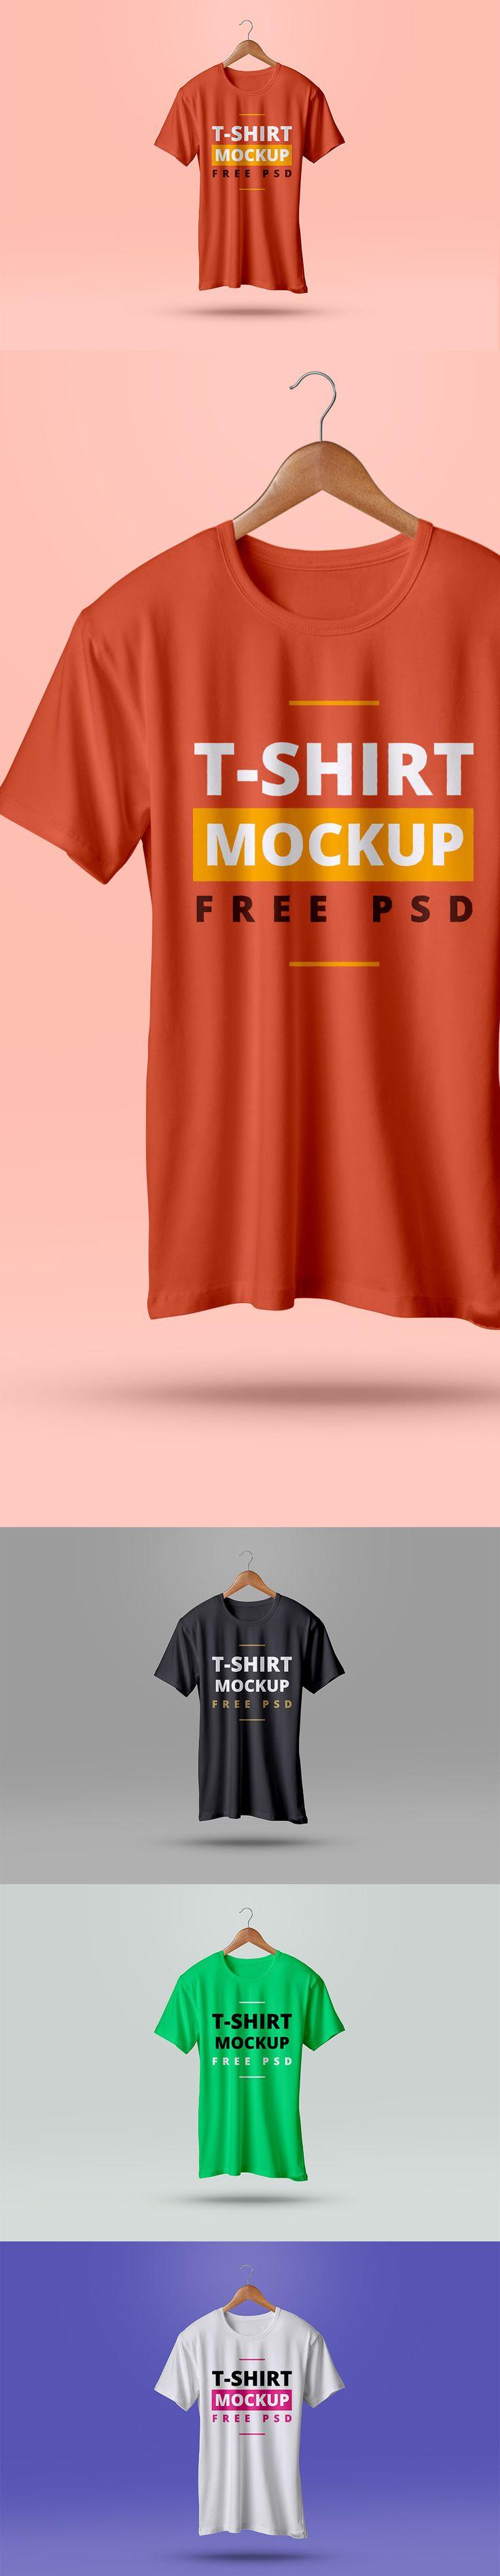 Best 25+ T shirt printing design ideas on Pinterest | Summer ...